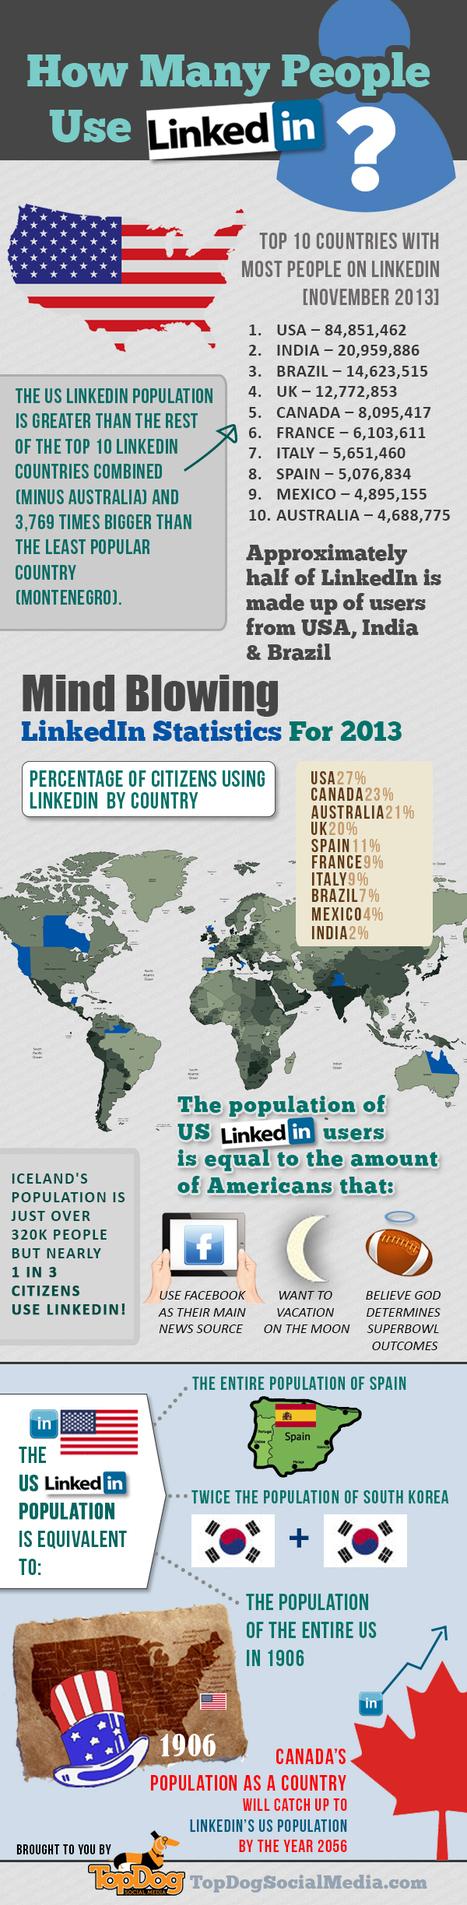 infographic linkedin socialmedia connecting business